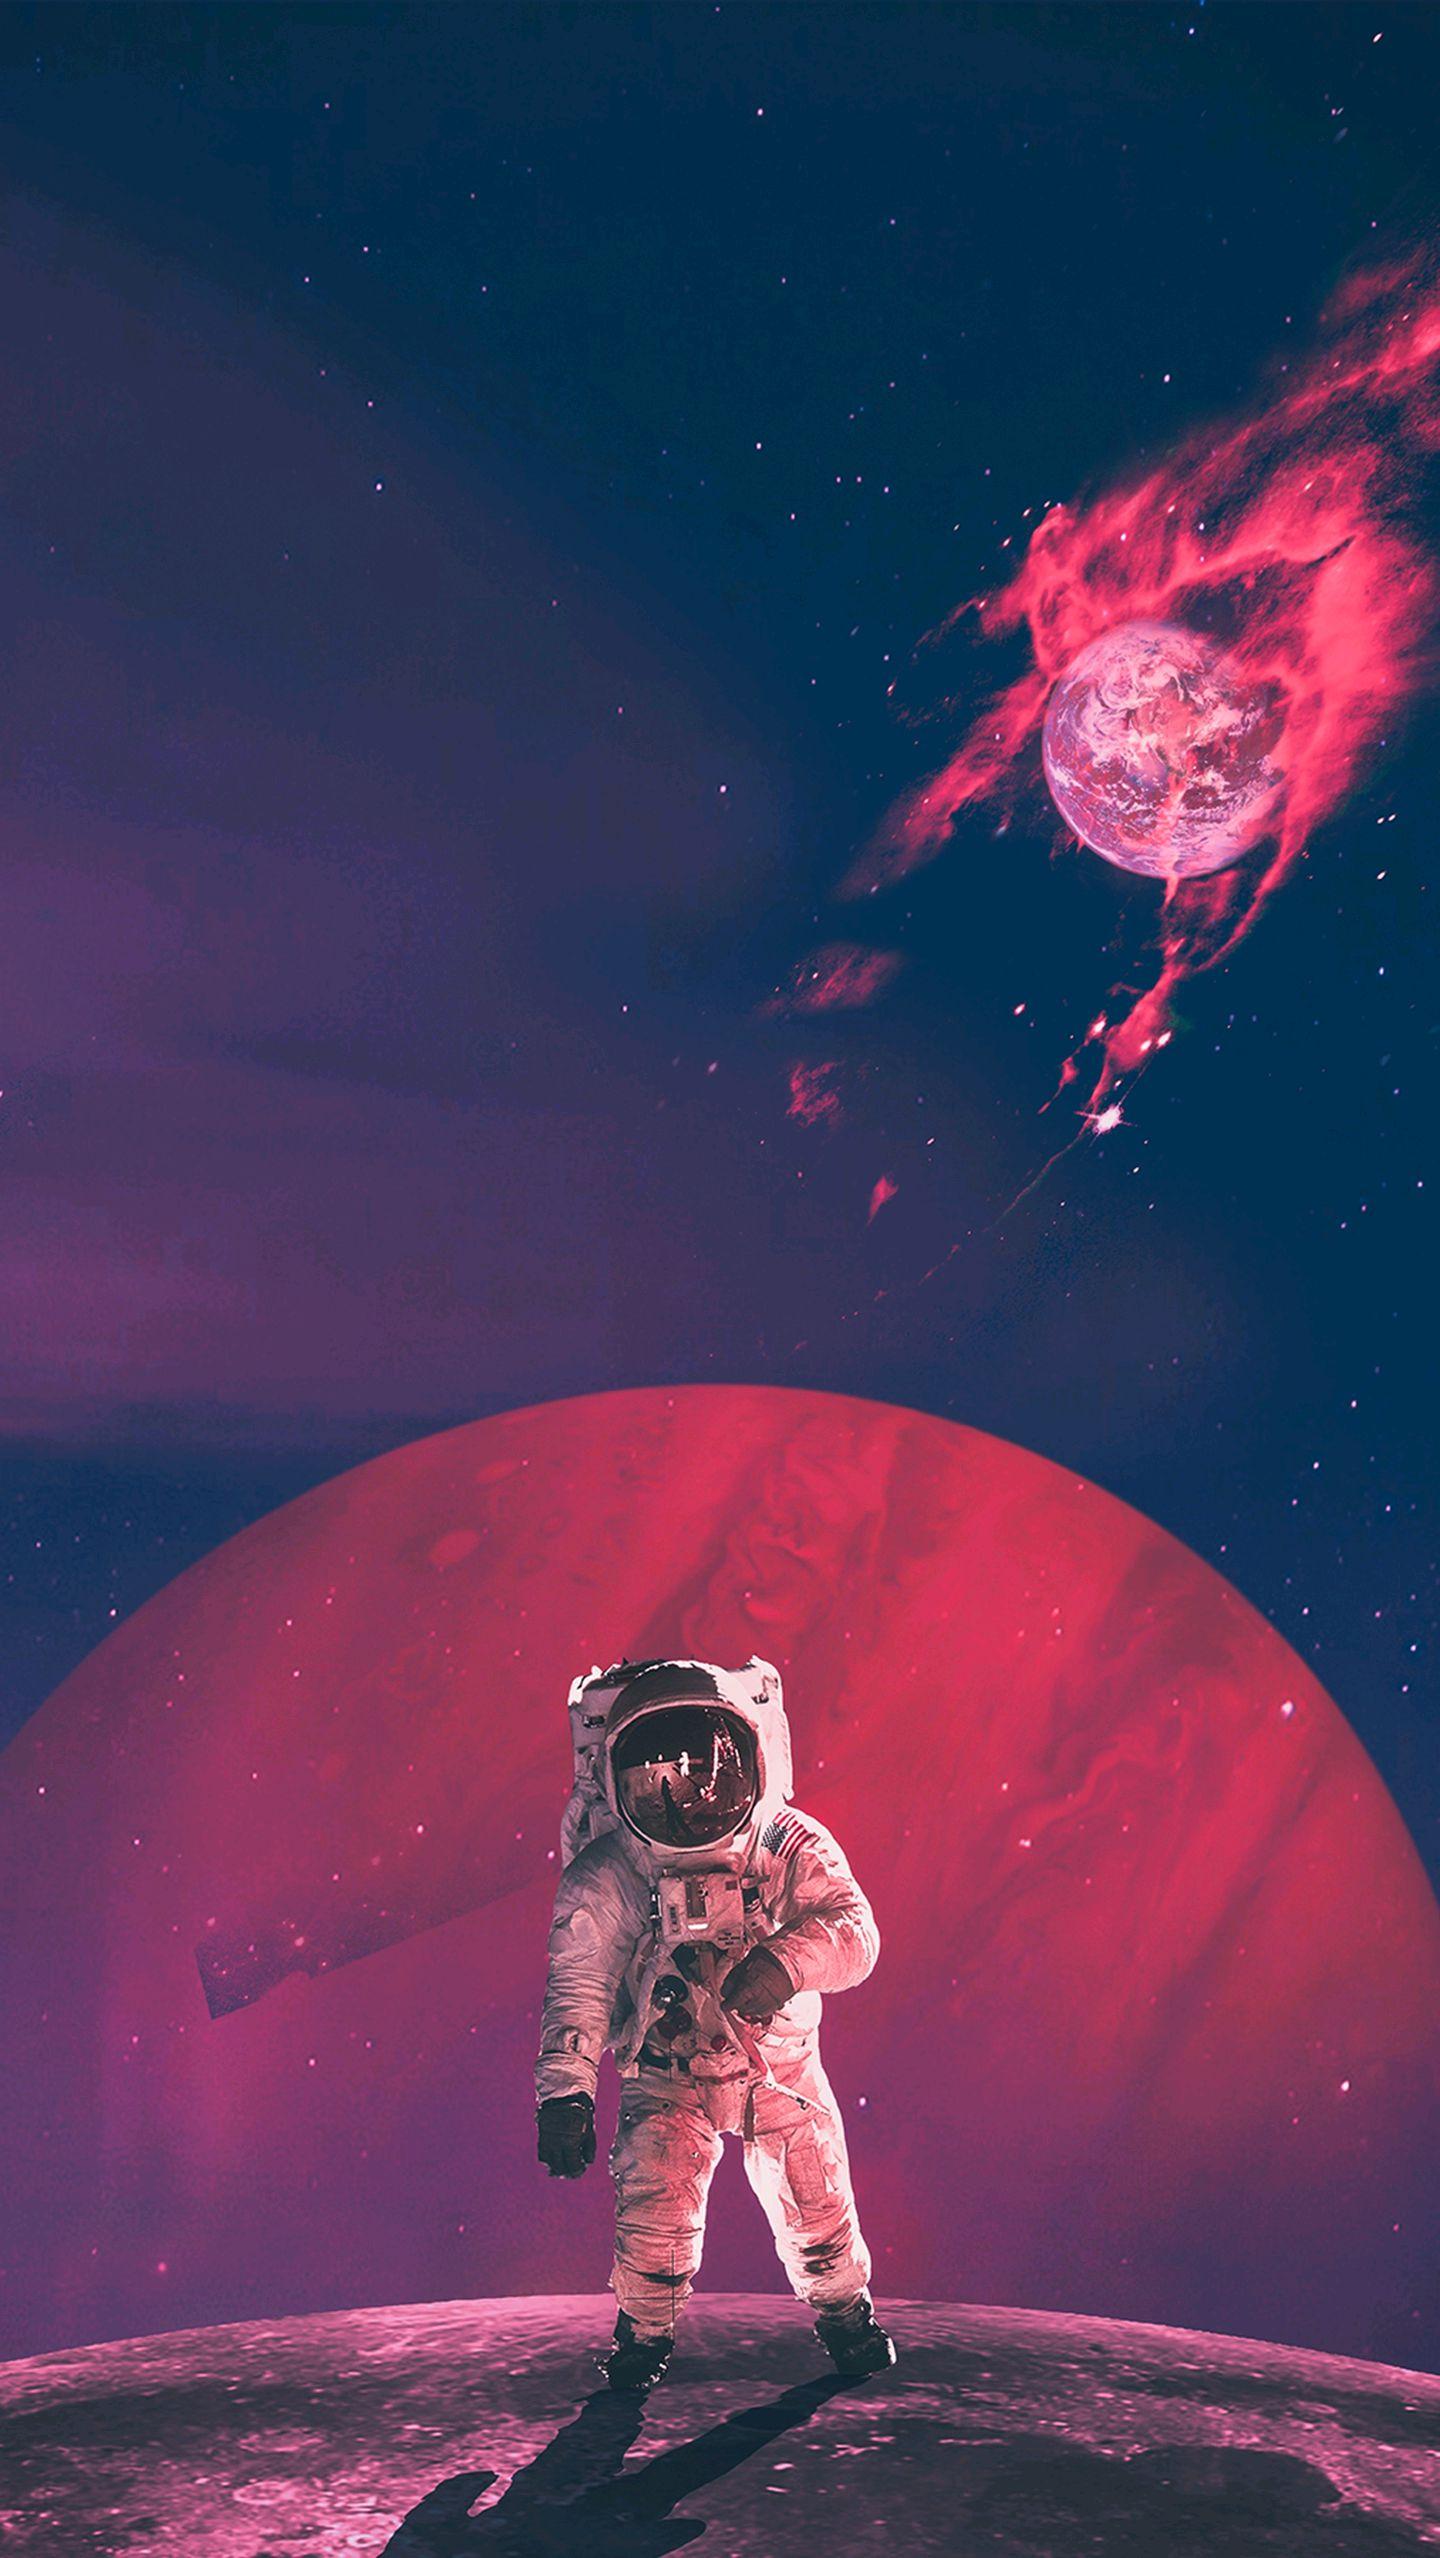 Cute Wallpapers For Desktop Free Download Astronaut Artwork Burning